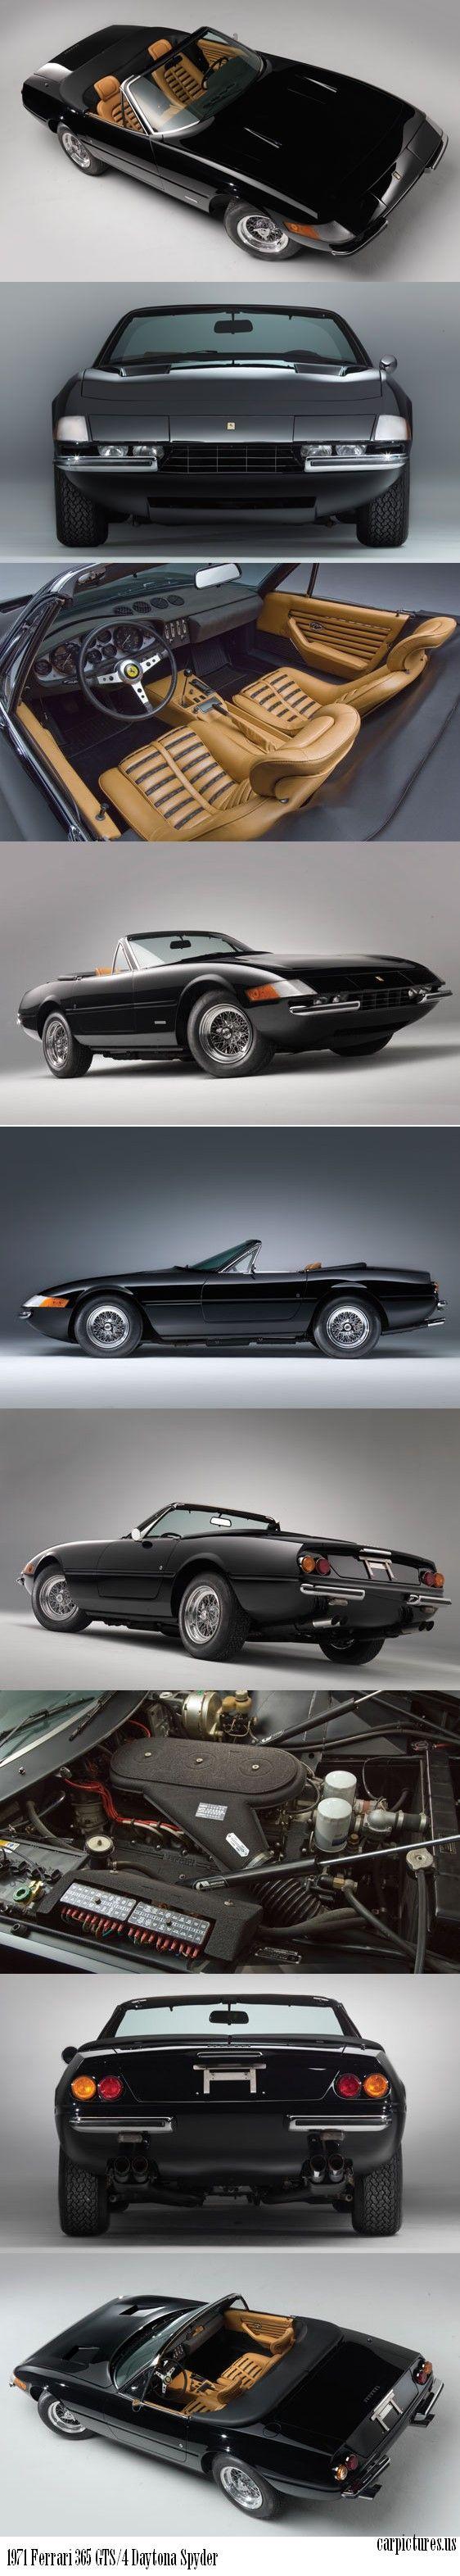 1971 Ferrari 365 GTS/4 Daytona Spyder, sorce: RM Auctions